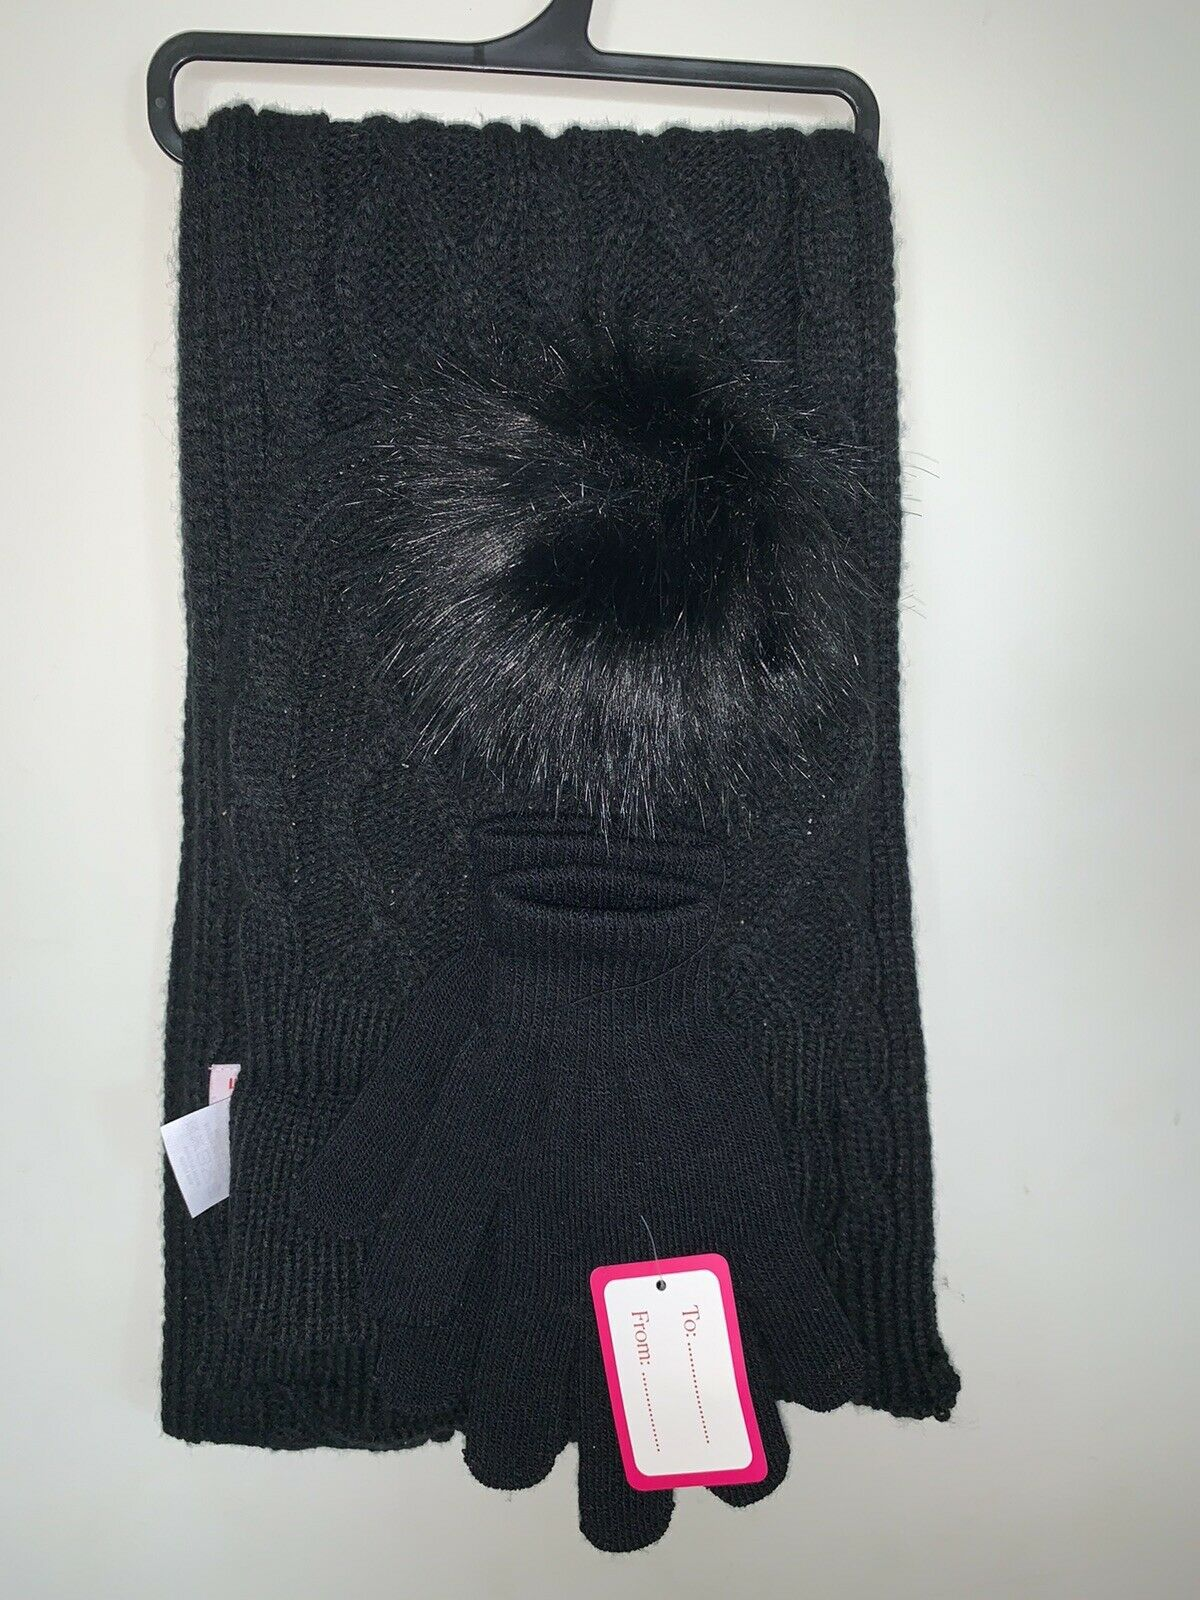 Rampage Black Set Of 3 Winter Accessories Set - Scarf, Hat, & Gloves Black NWT